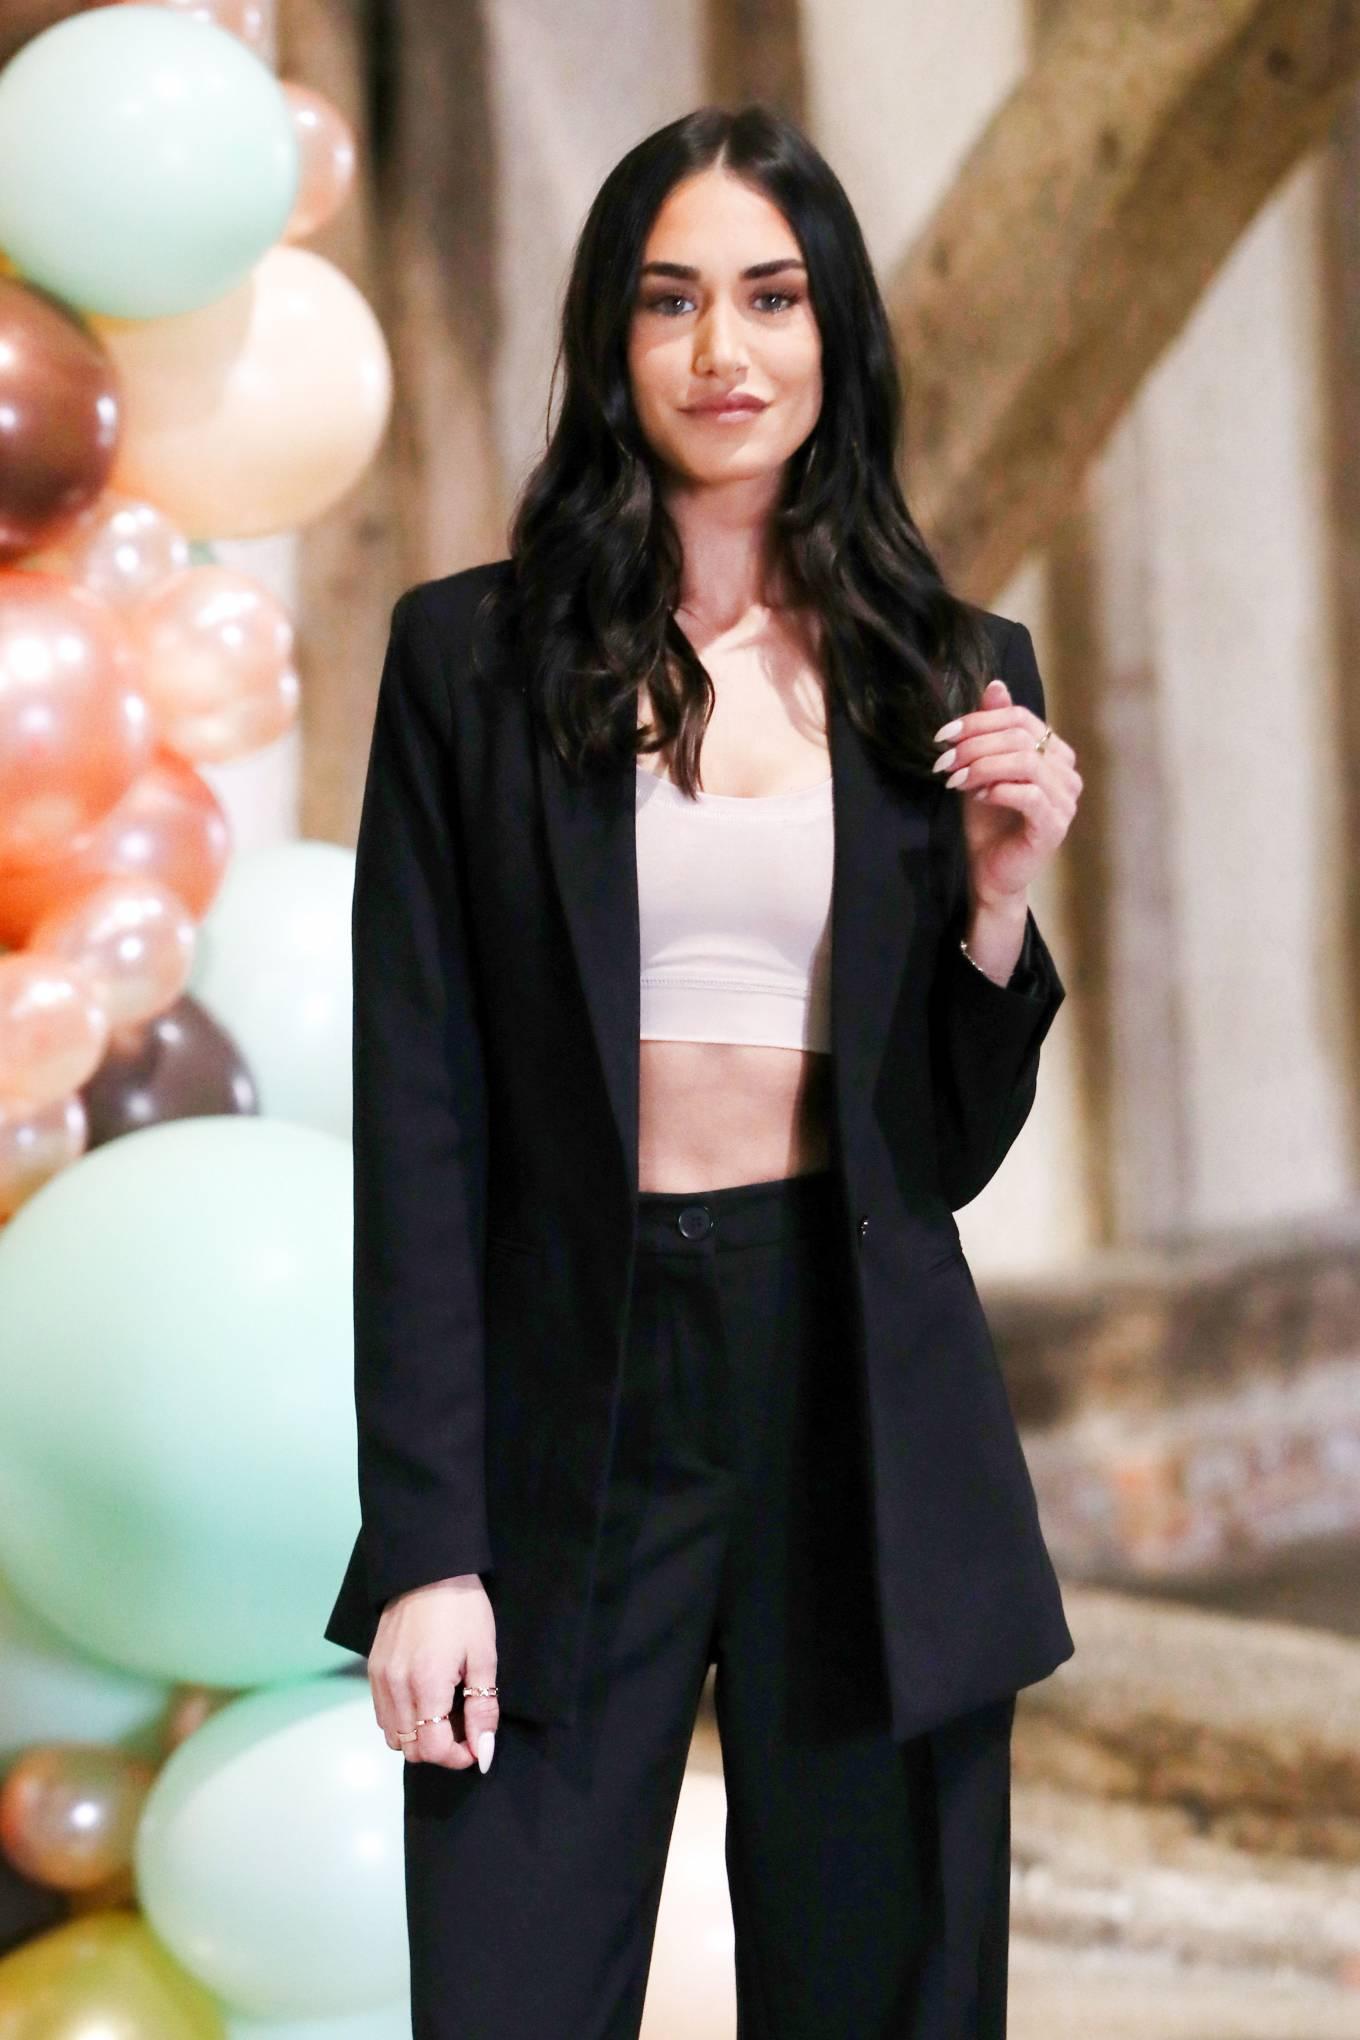 Clelia Theodorou 2021 : Clelia Theodorou – The Only Way is Essex TV Show filming in Braintree-03